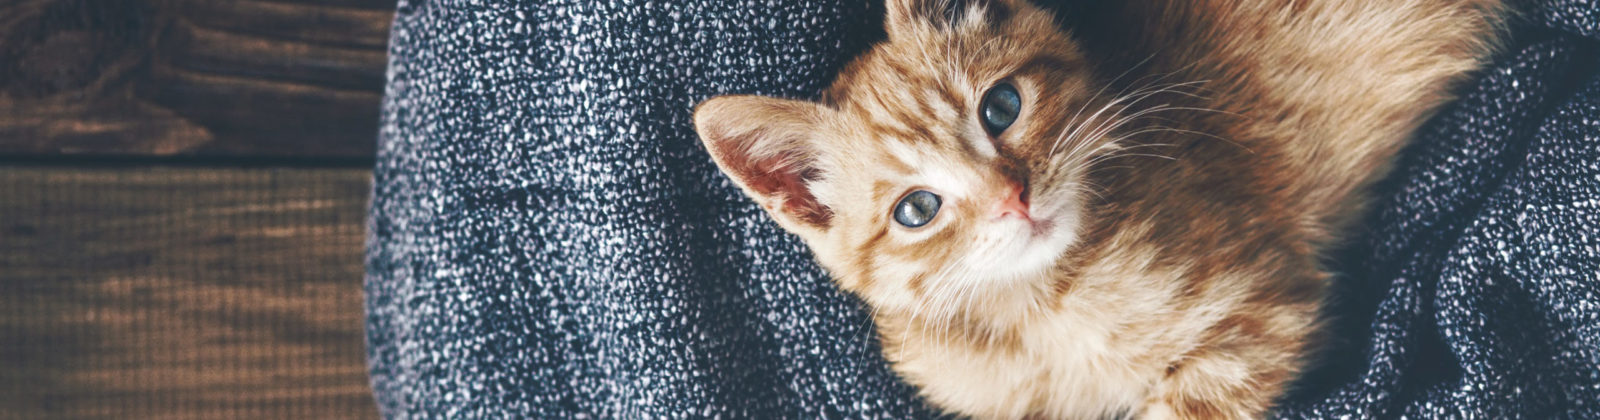 kitten home alone